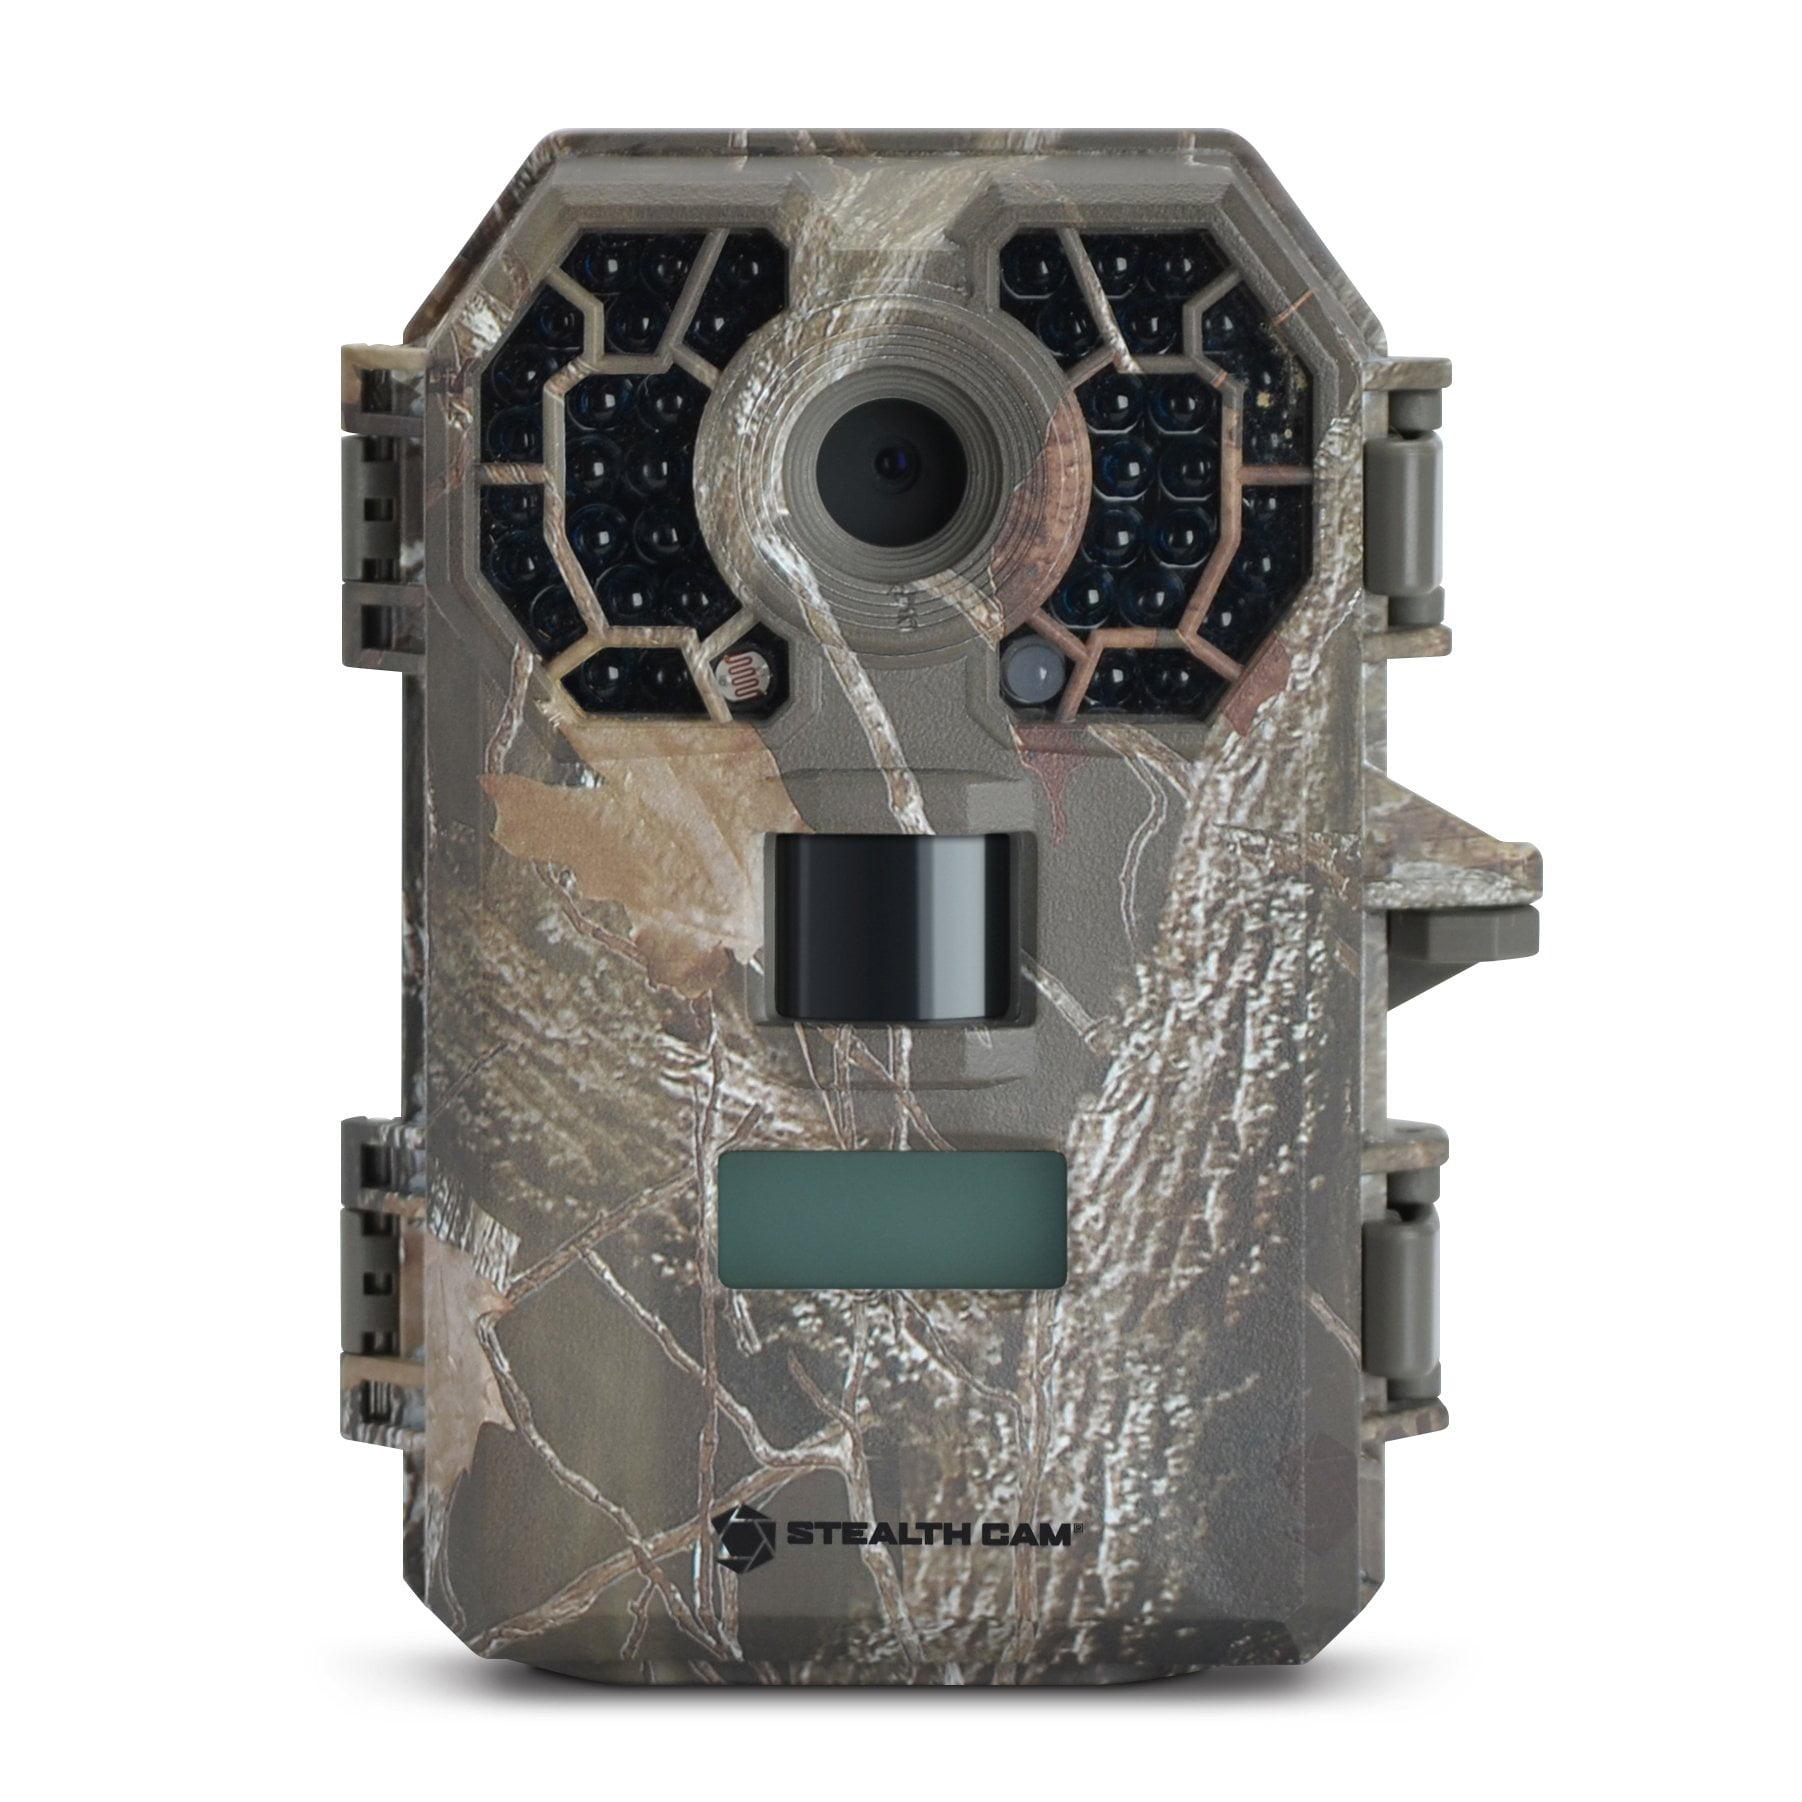 Stealth Cam STC-G42NG V1 Camera 64 BIT